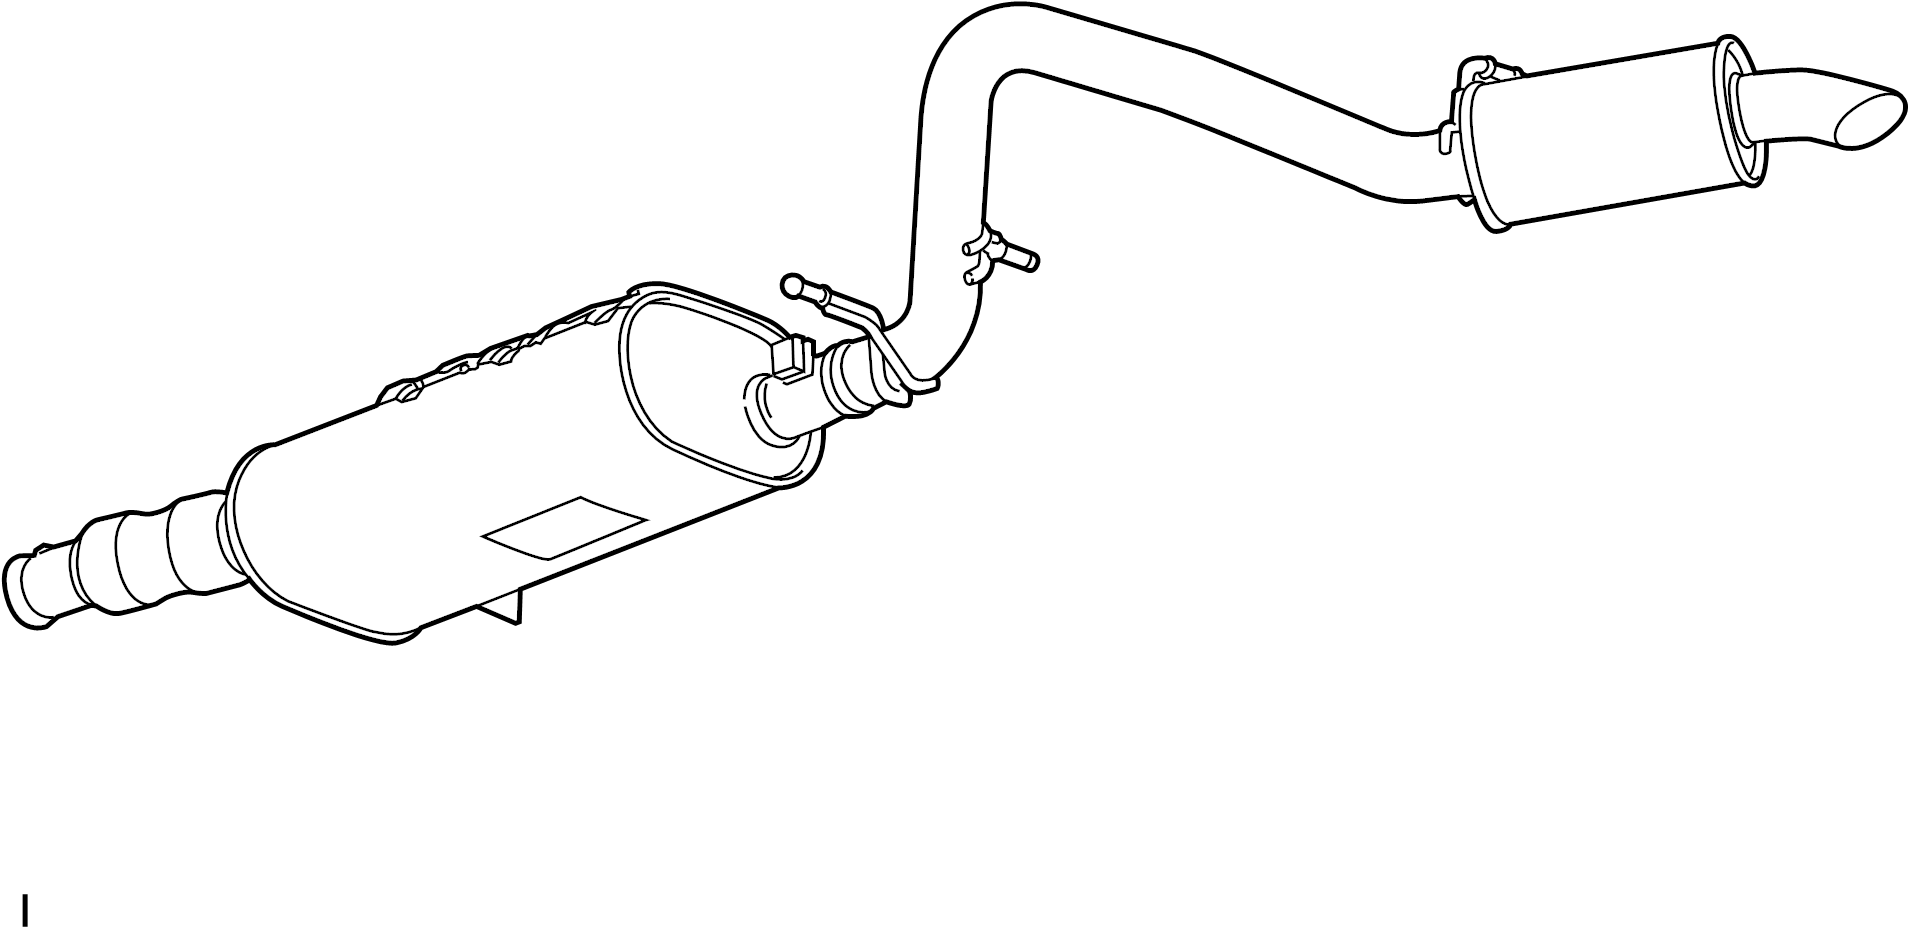 Gmc Yukon Exhaust Muffler 5 3 Liter 6 2 Liter Escalade